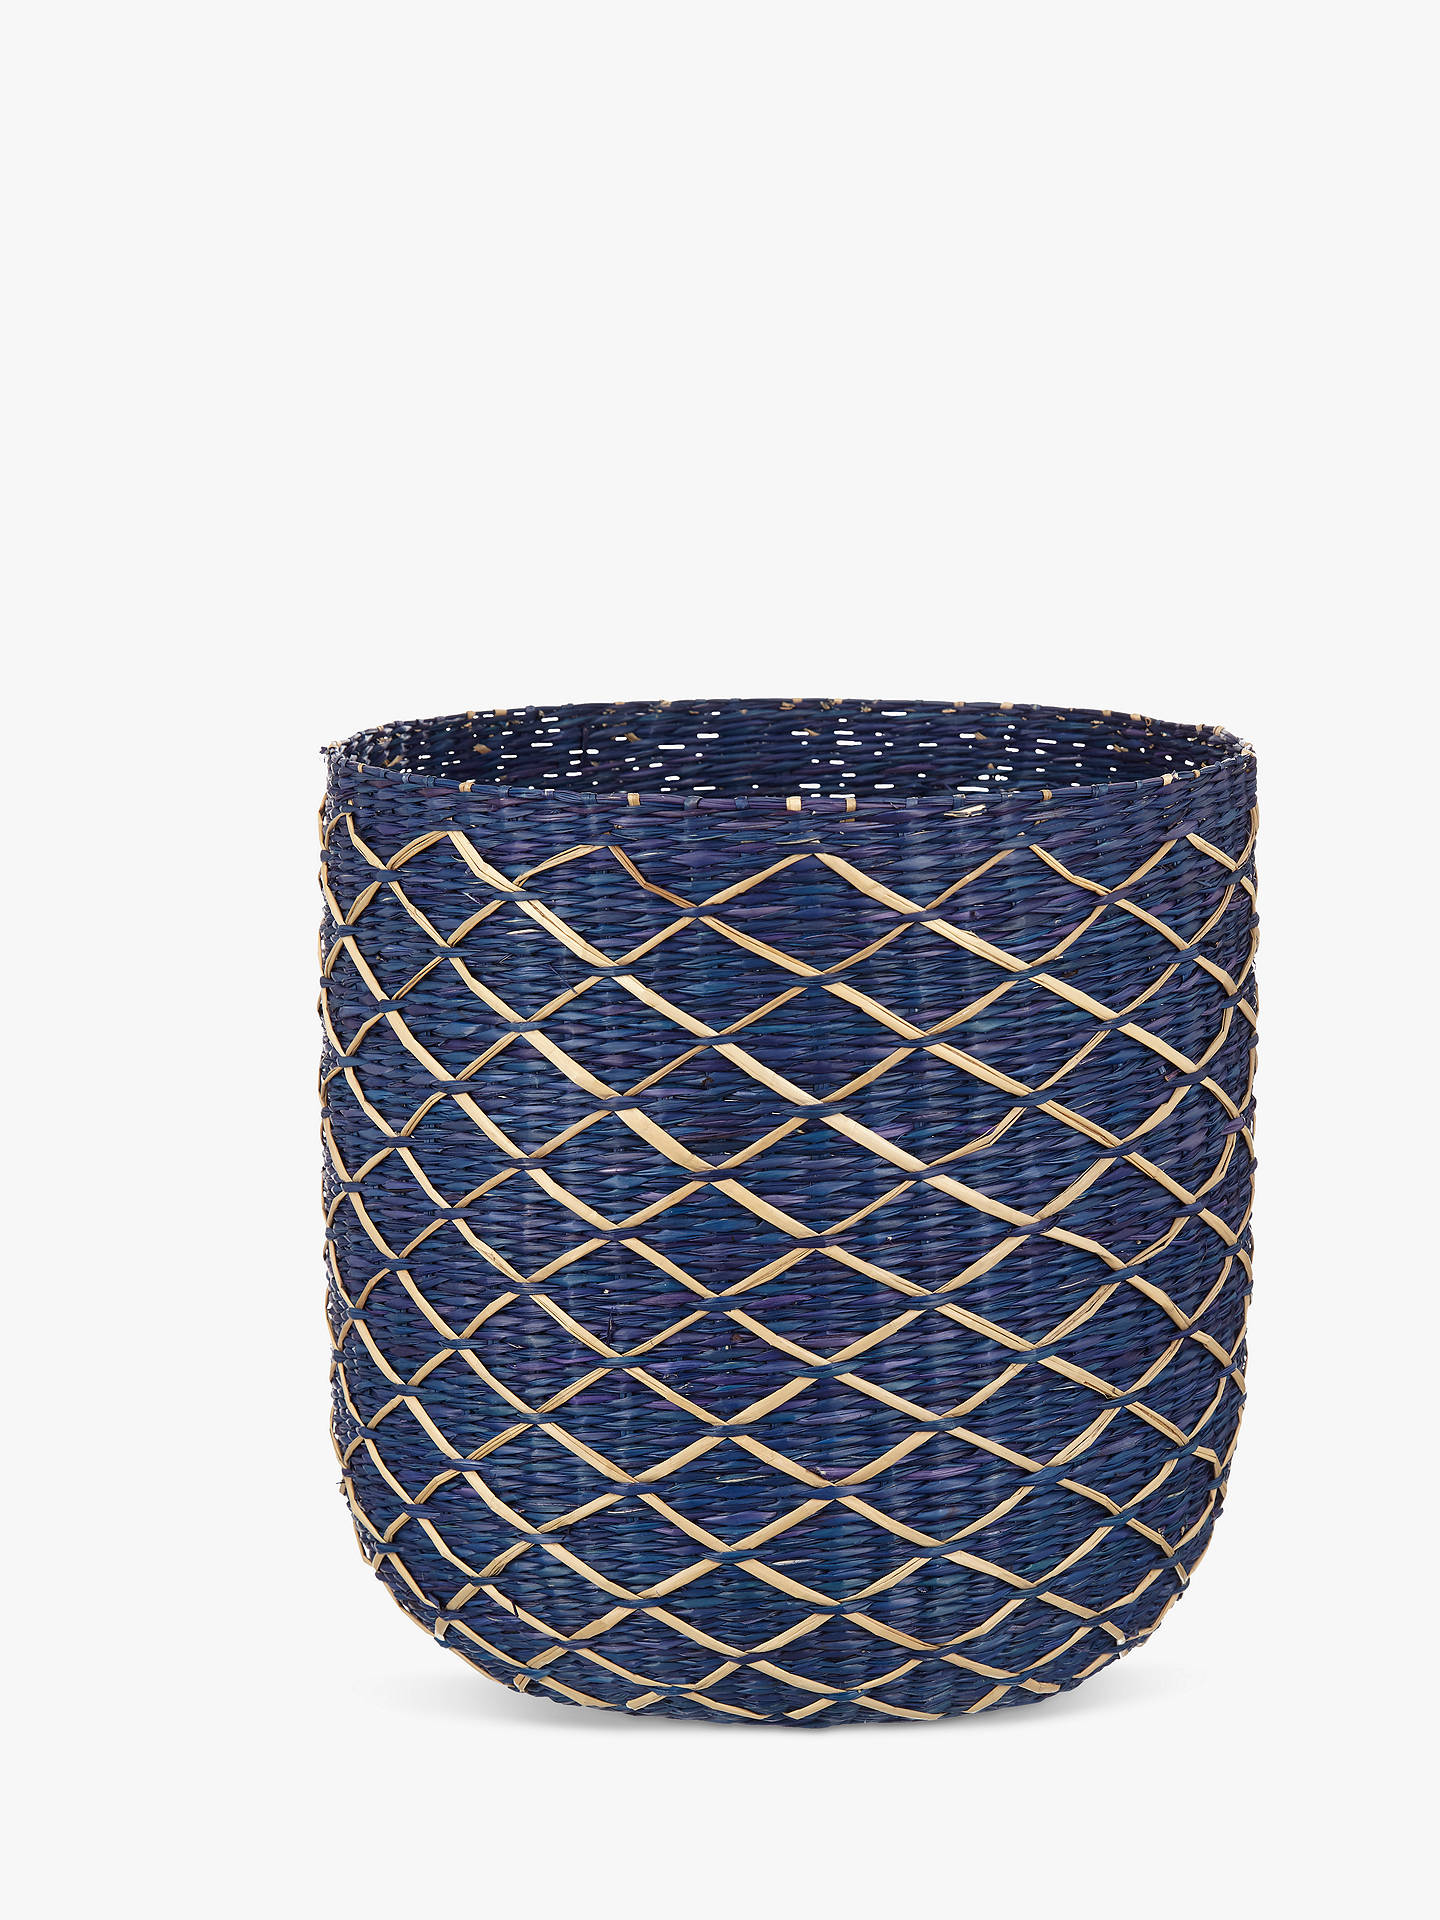 Buy John Lewis & Partners Fusion Blue Weave Waste Paper Bin, Blue Cobalt Online at johnlewis.com